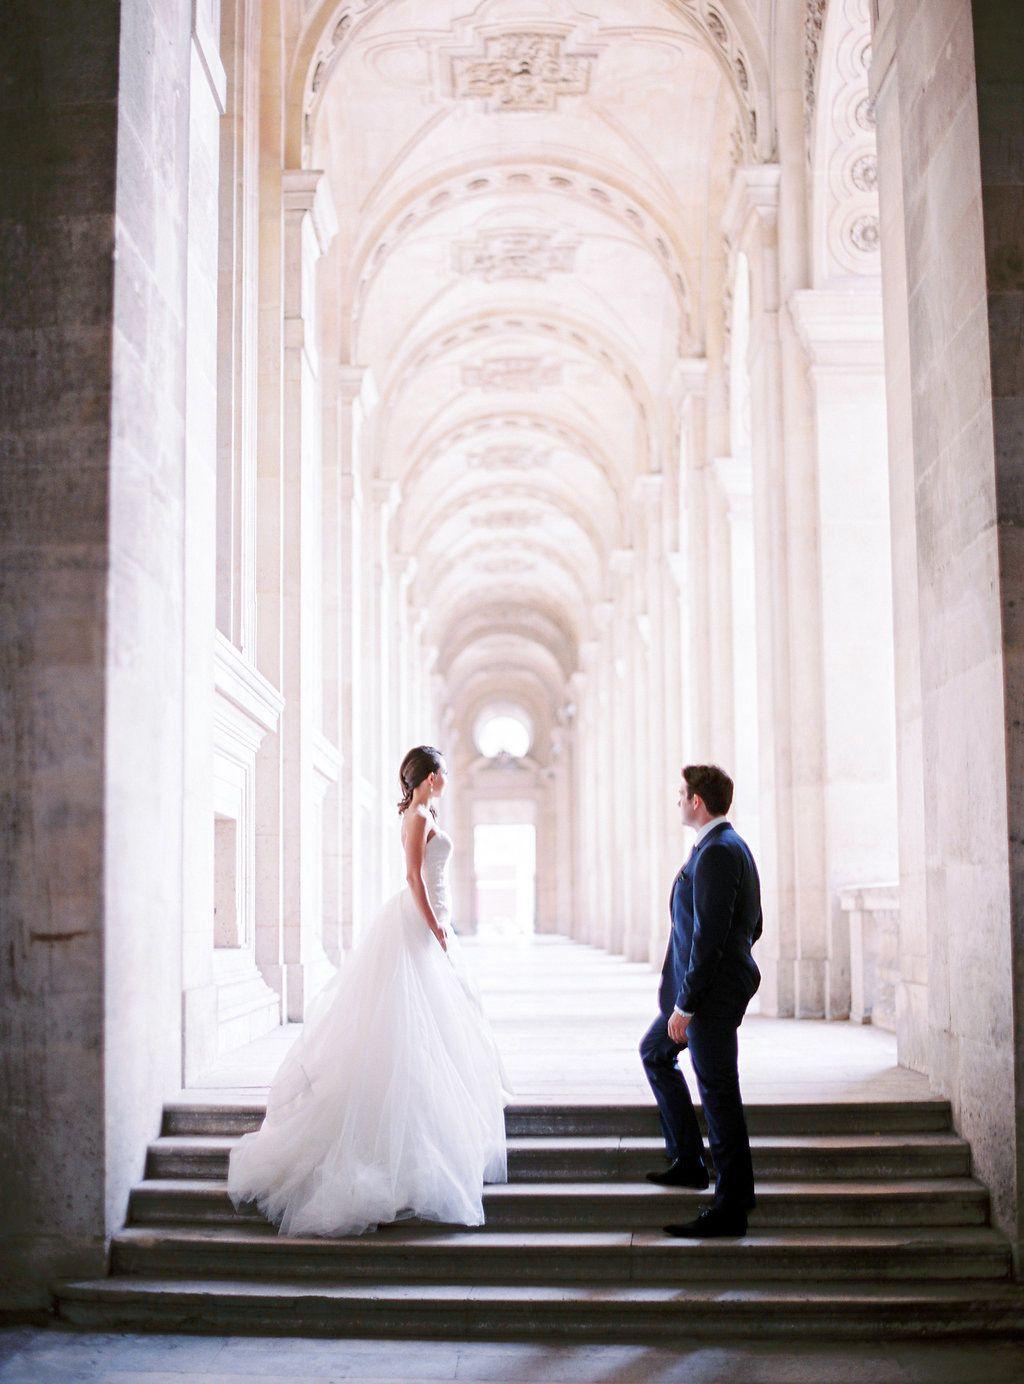 15 Best Wedding Destinations For Beautiful Photos - Wedding Photography